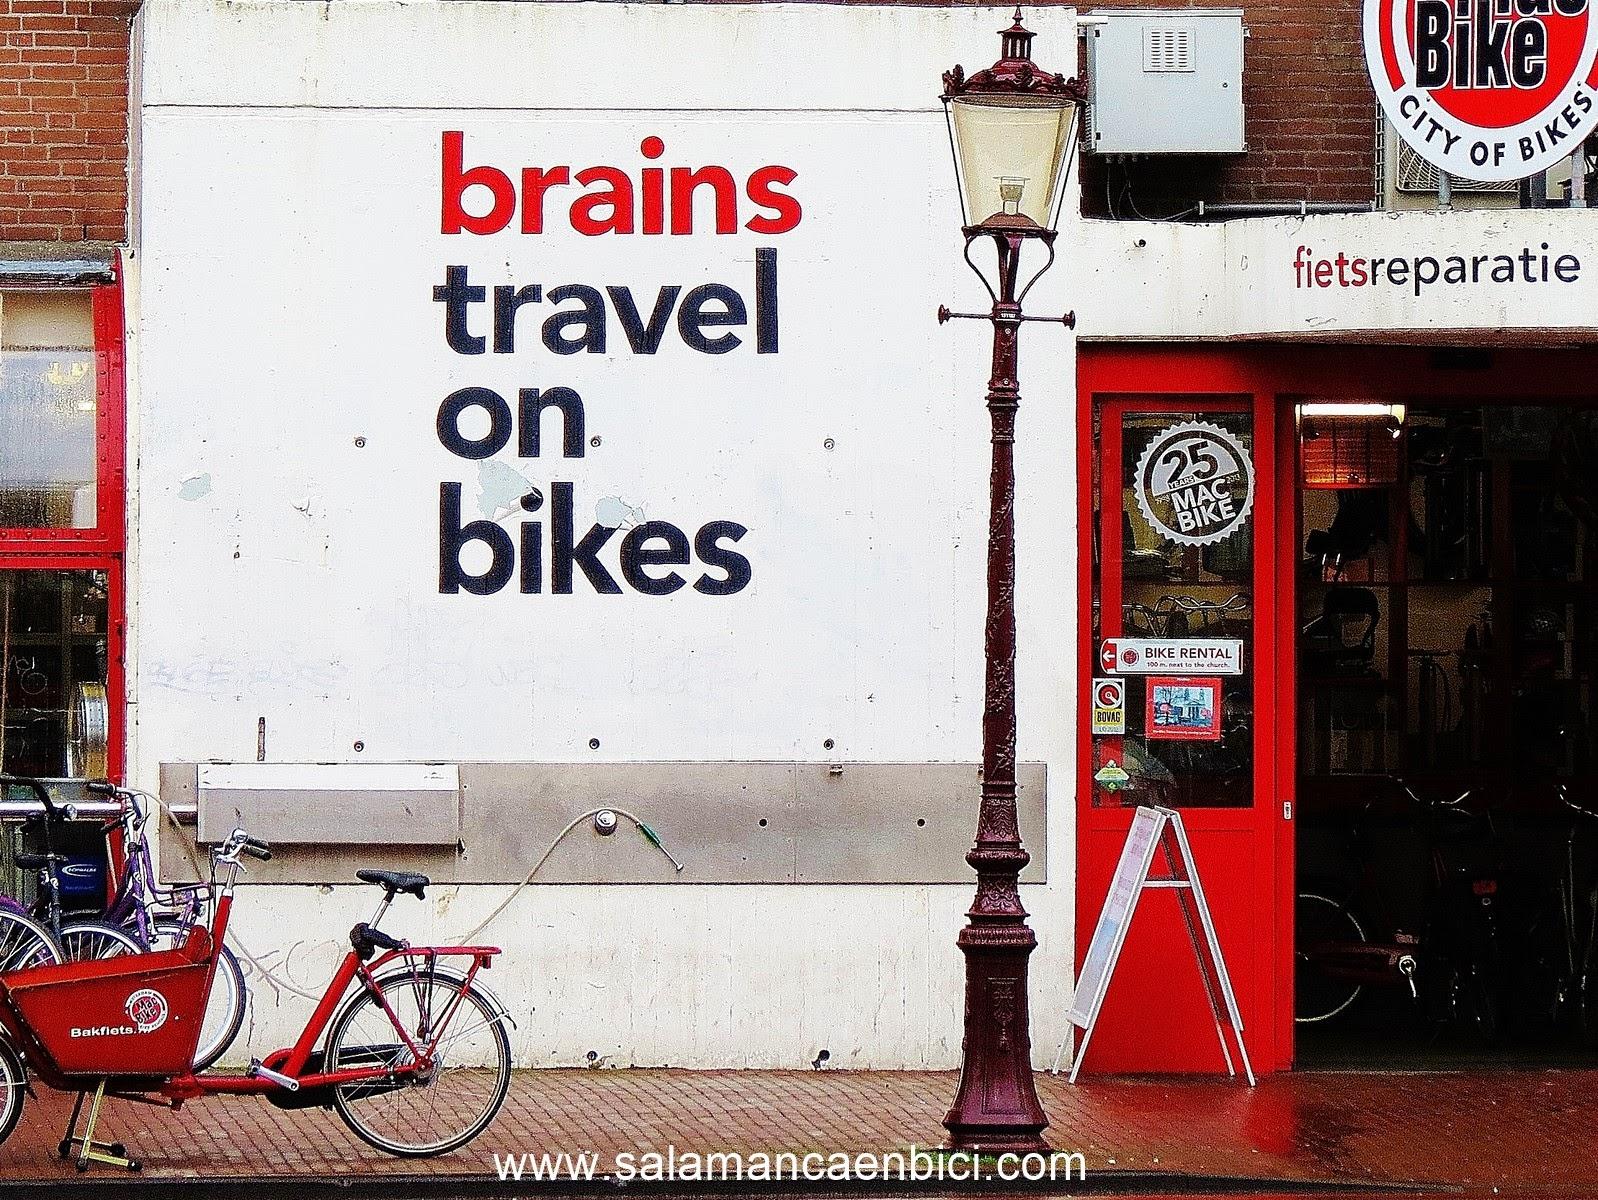 Juandaniel Elorza-Saravia ciclogénesis semana de la bici 2015